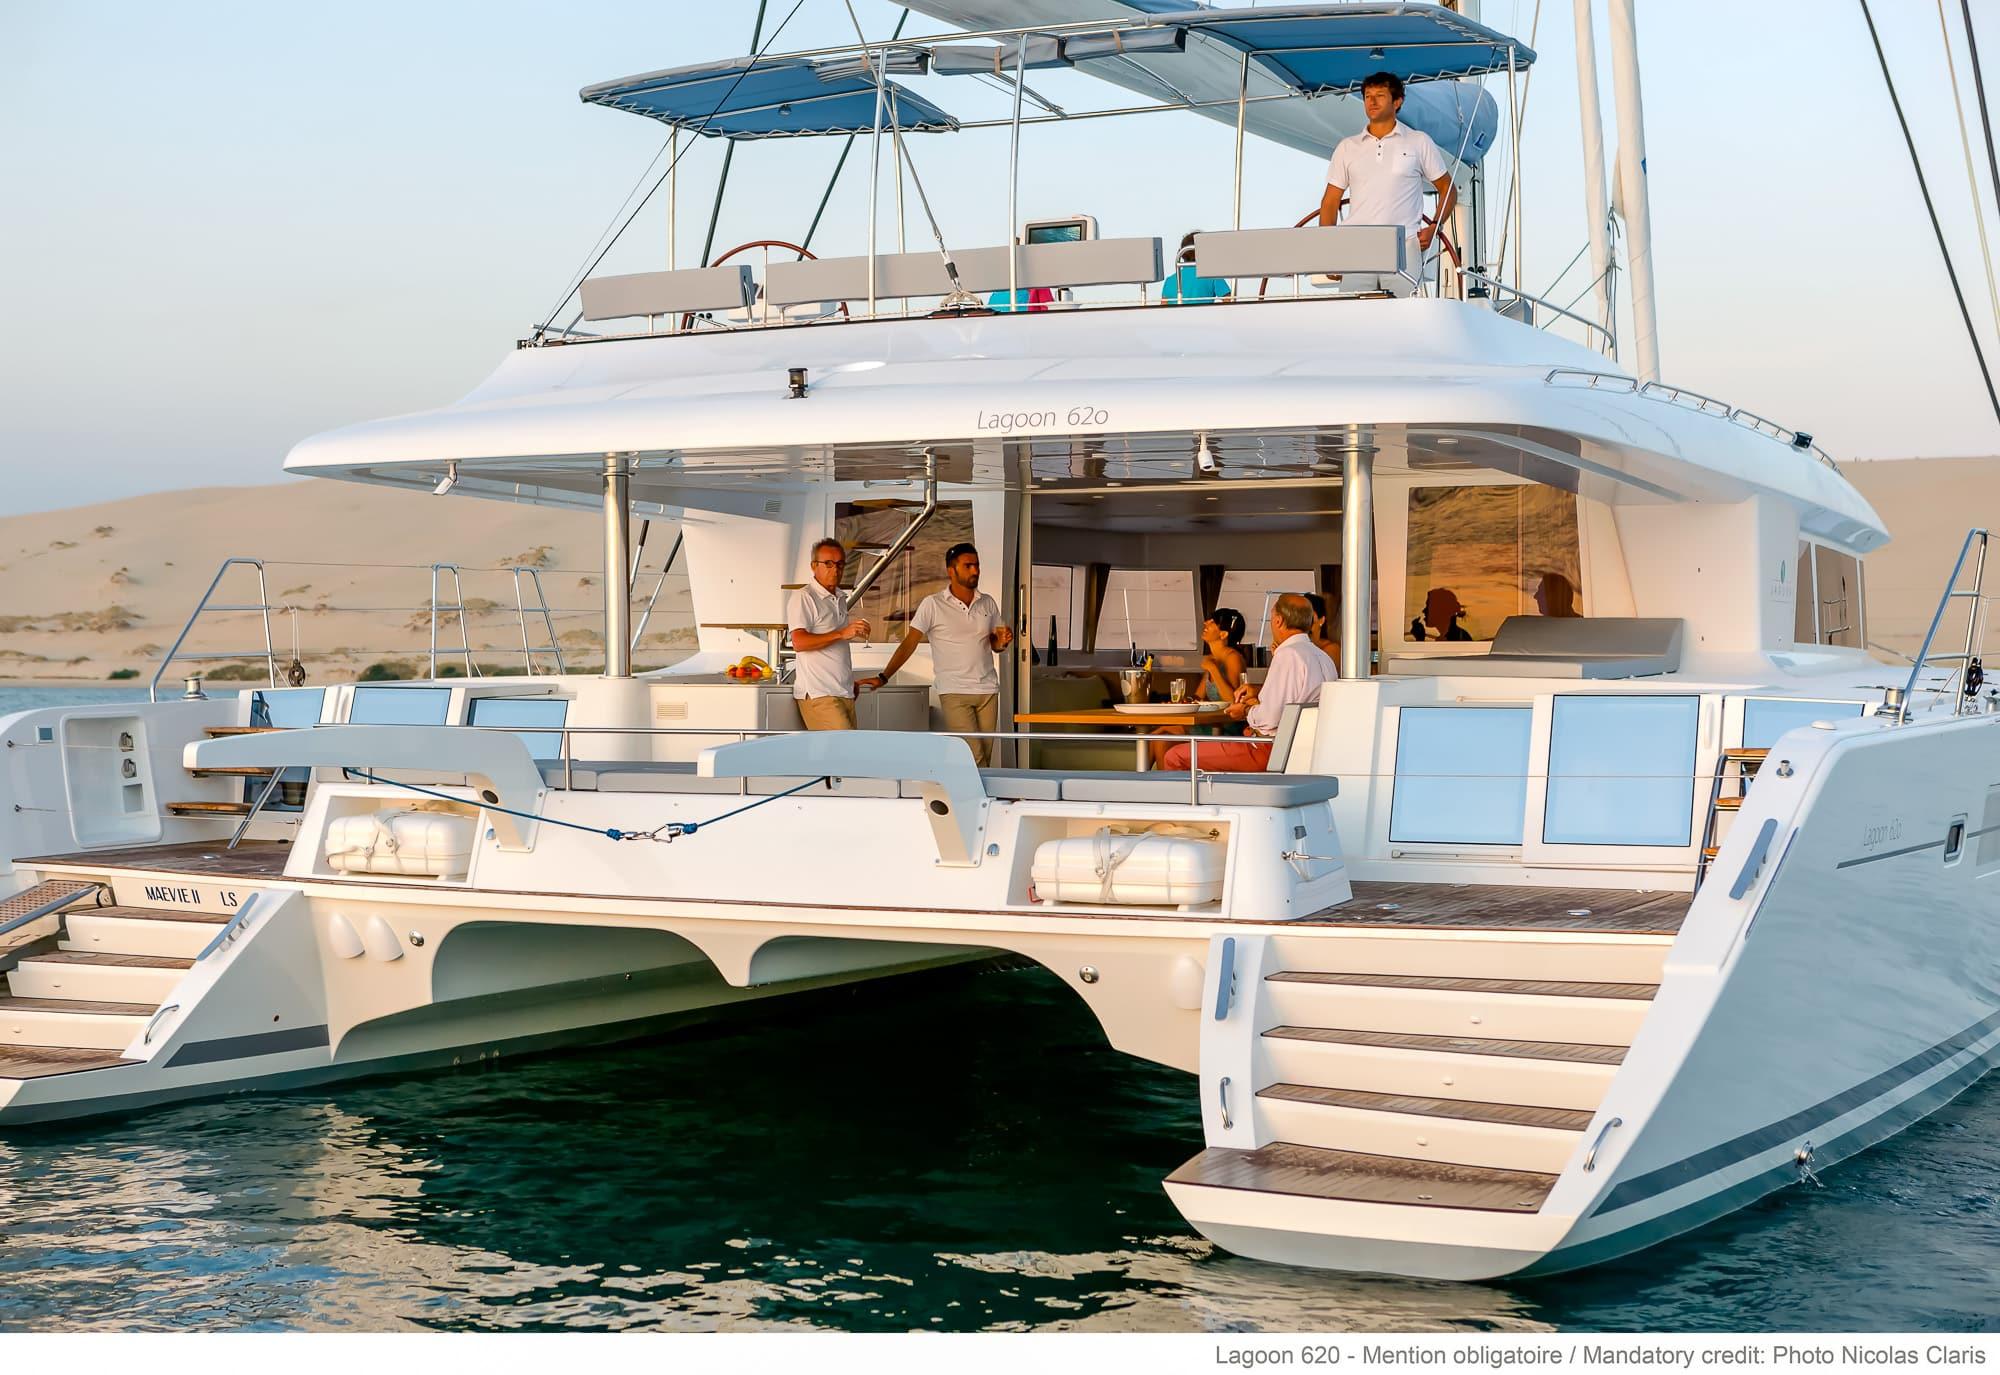 lagoon-620-yacht-charter-croatia-sailing-holidays-croatia-booking-yacht-charter-croatia-catamarans-sailboats-motorboats-gulets-luxury-yachts-boat-rental-croatia-14